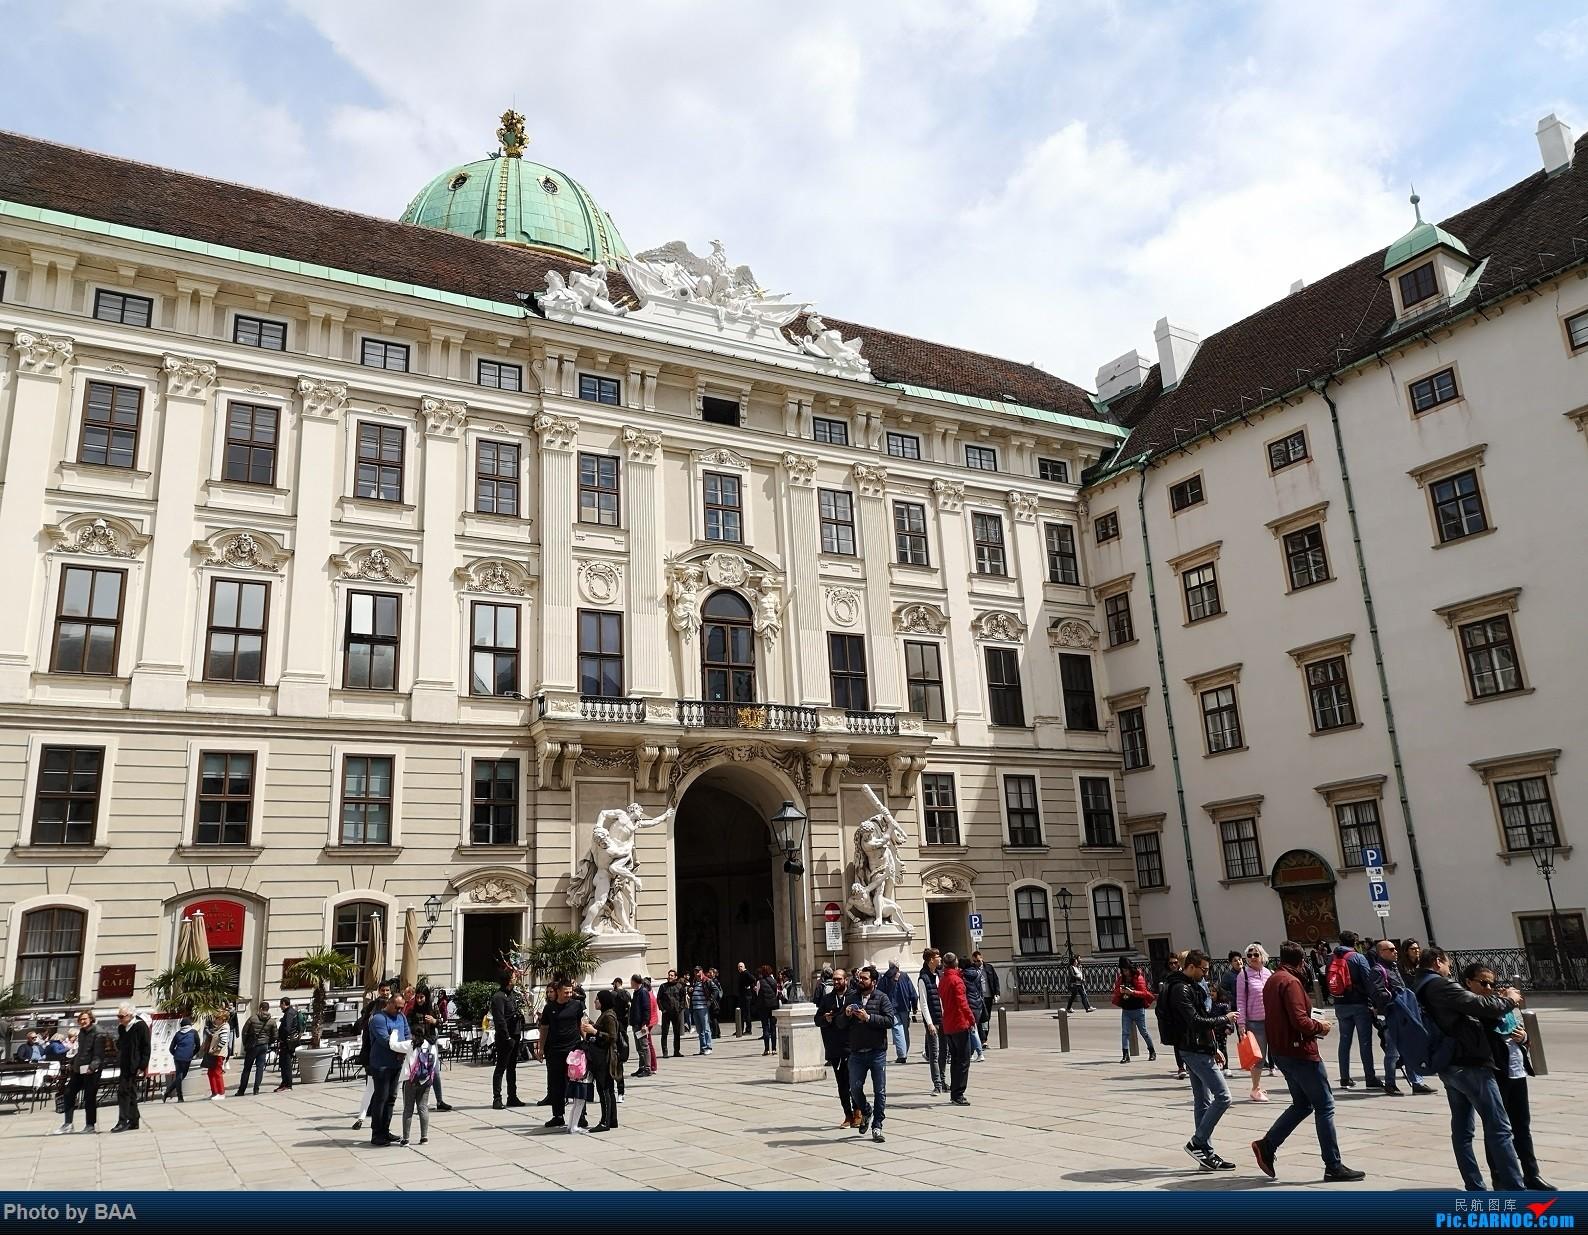 Re:[原创]《带你去旅行》之维也纳之旅